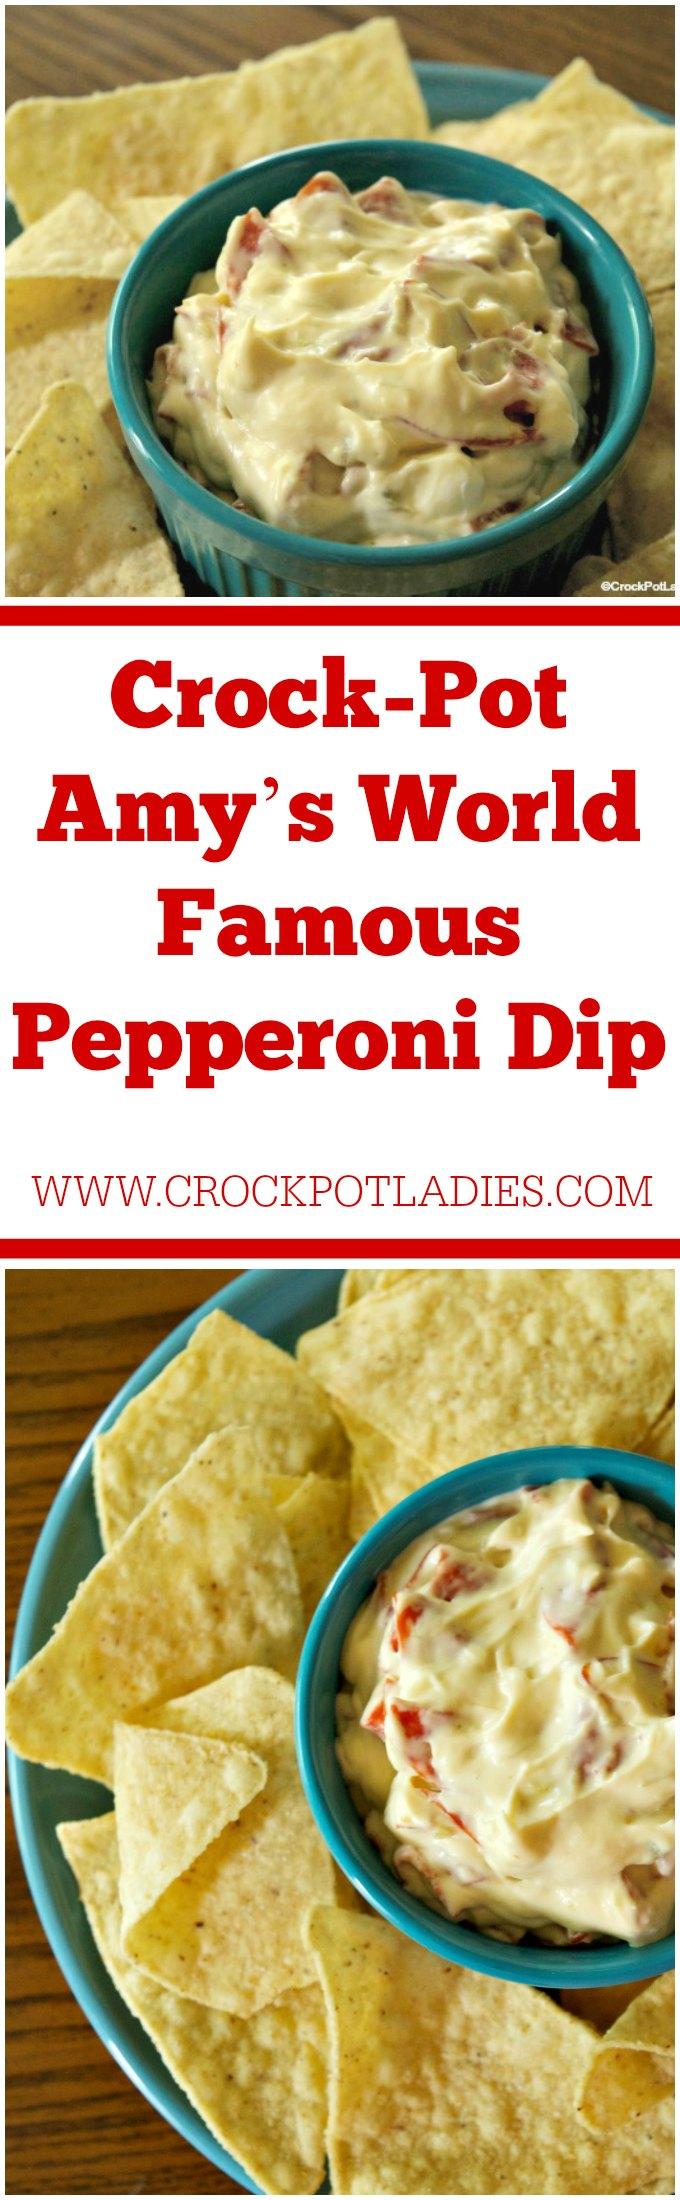 Crock-Pot Amy's World Famous Pepperoni Dip